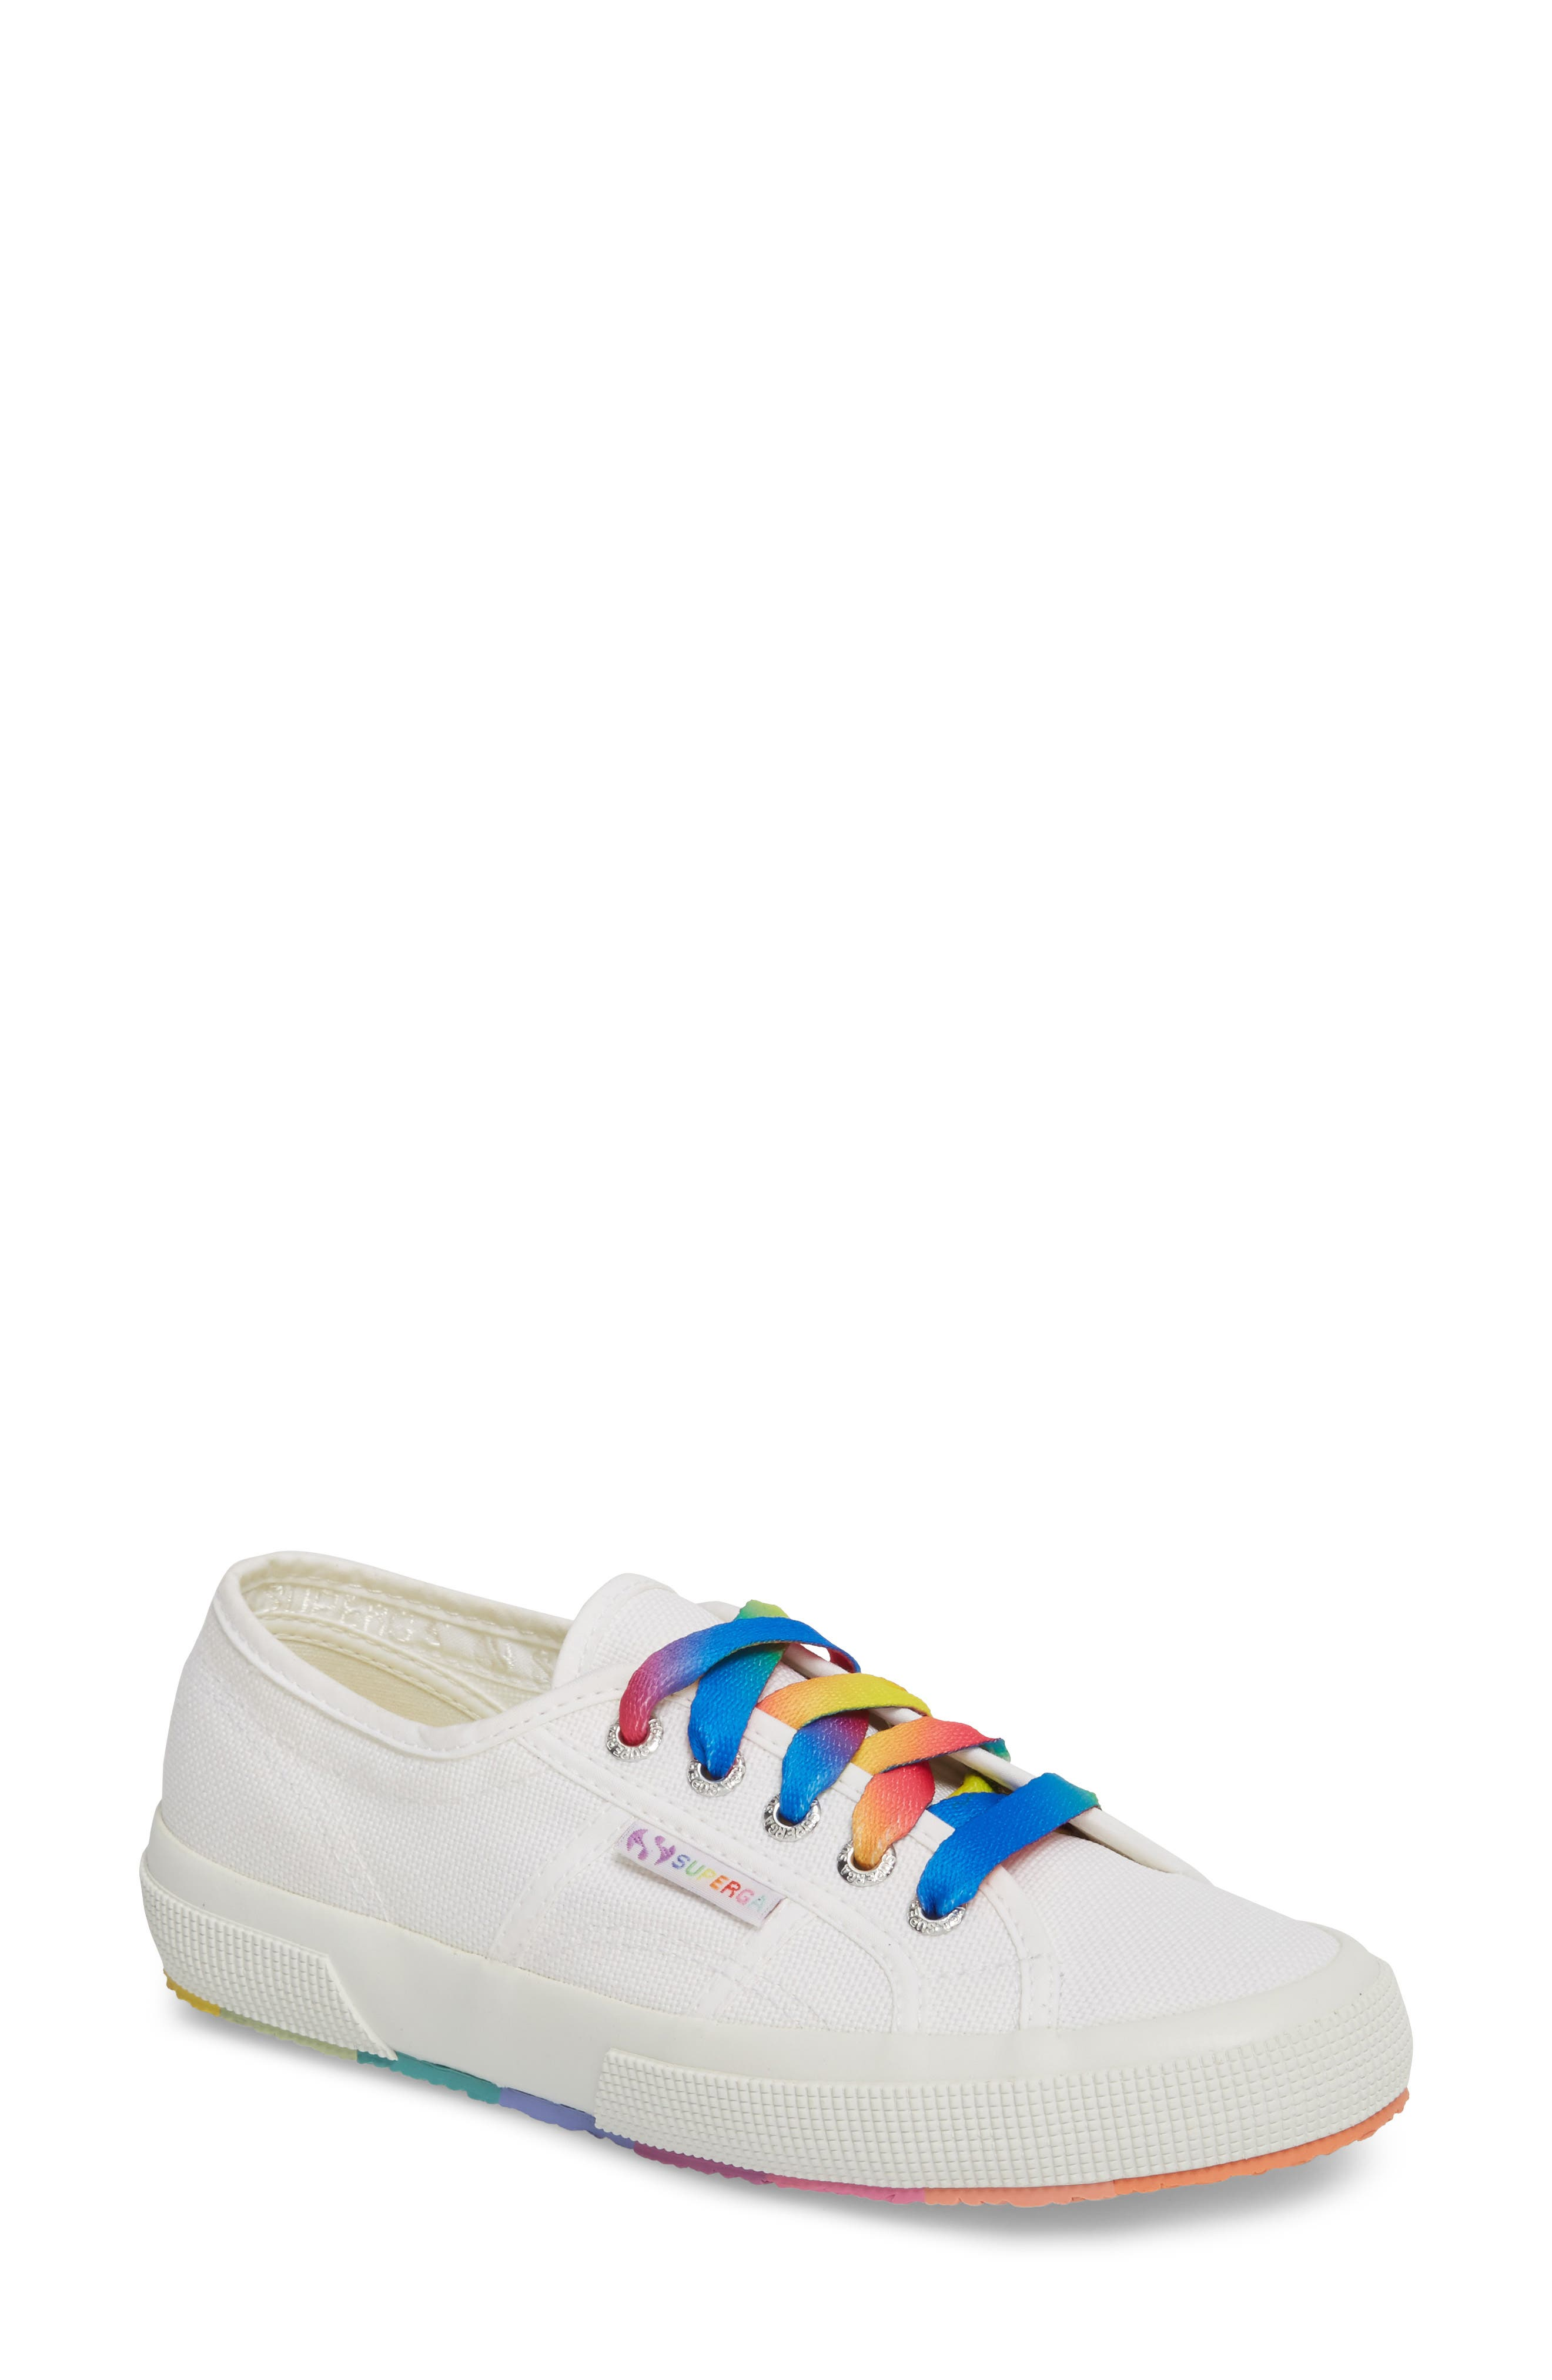 2750 Multicolor Sneaker,                             Main thumbnail 1, color,                             White Multi